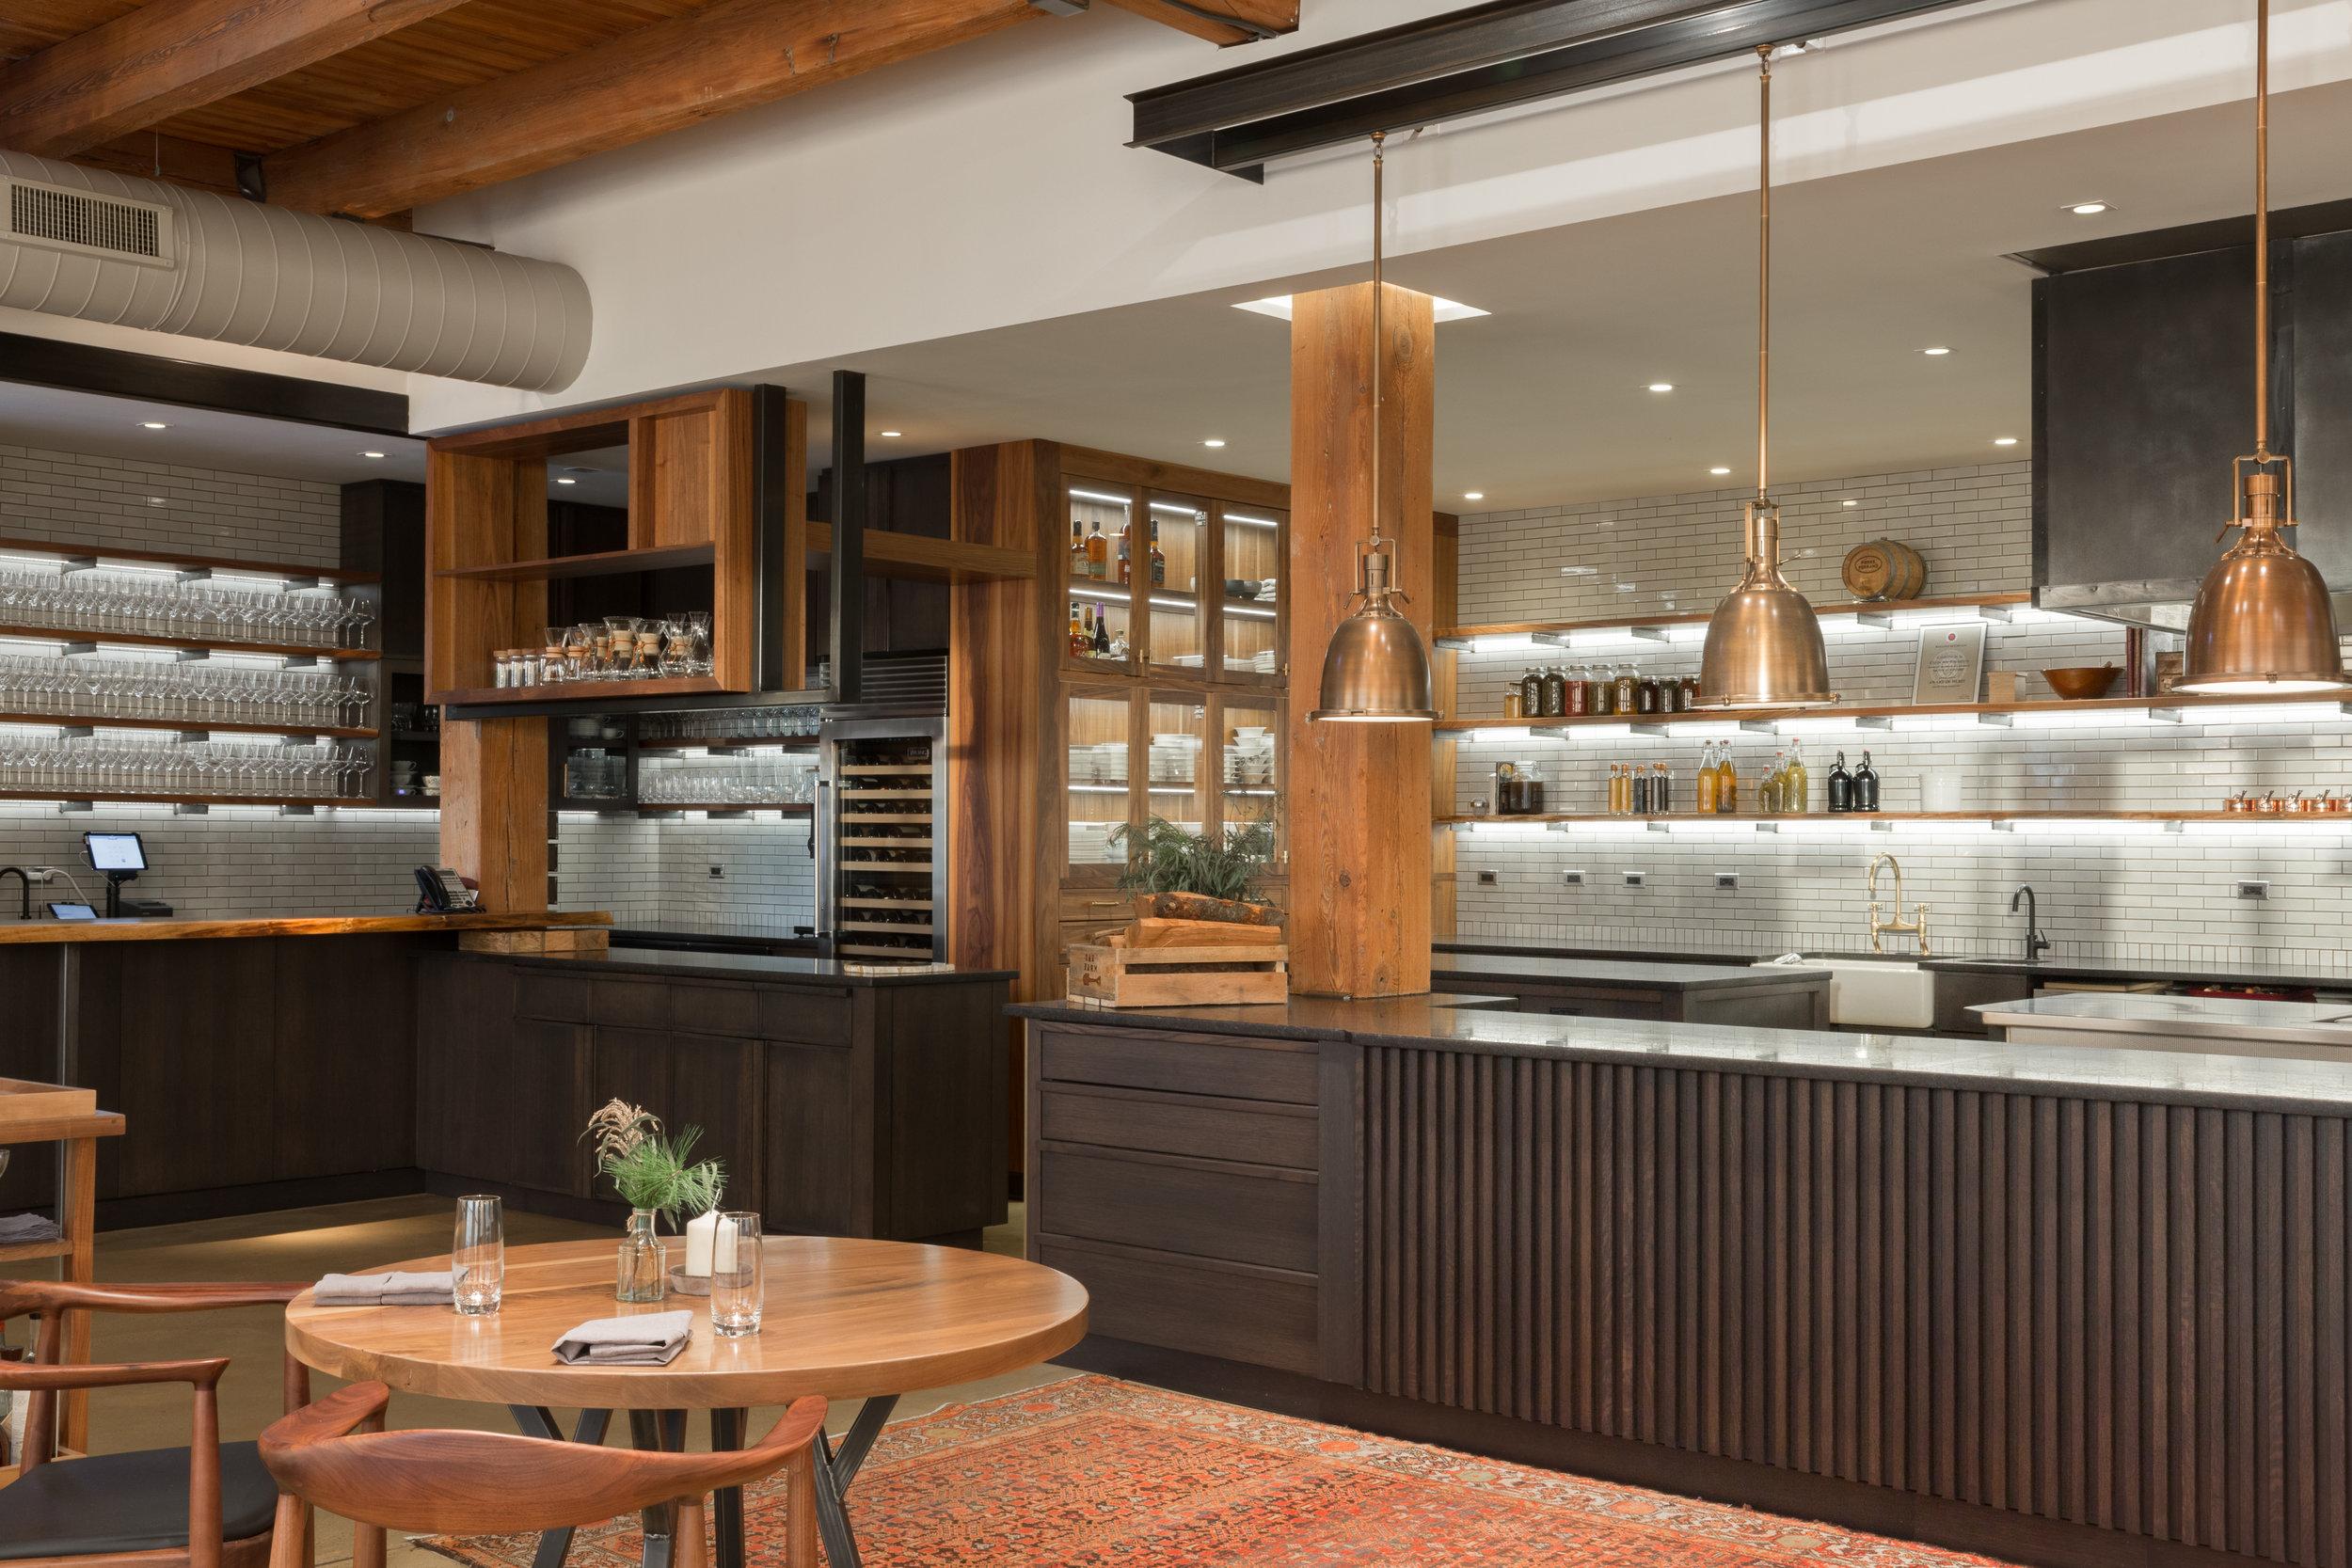 studio-saint-bars-and-restaurants-smyth-and-the-loyalist-washington-dc-8